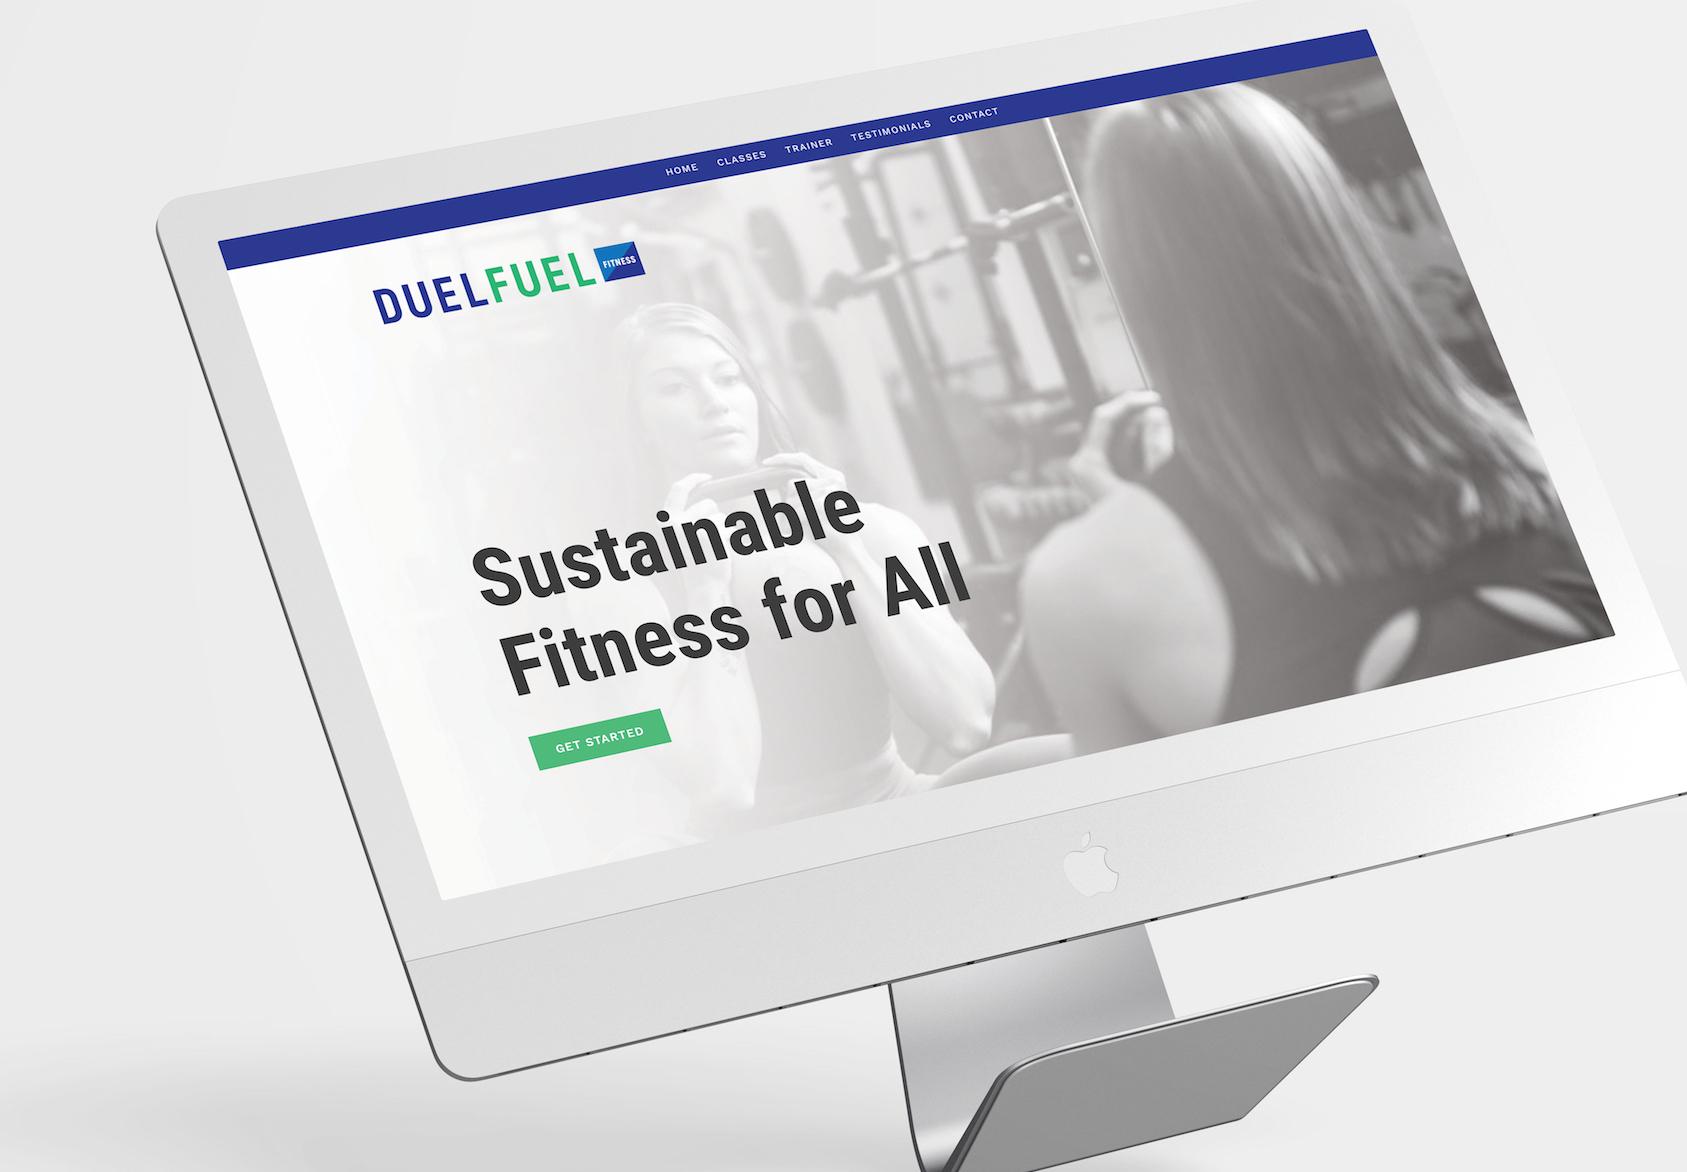 Golden-Antler-Design-Milwaukee-Web-Branding-Marketing-Duel-Fuel-Fitness-Web-Development-Squarespace